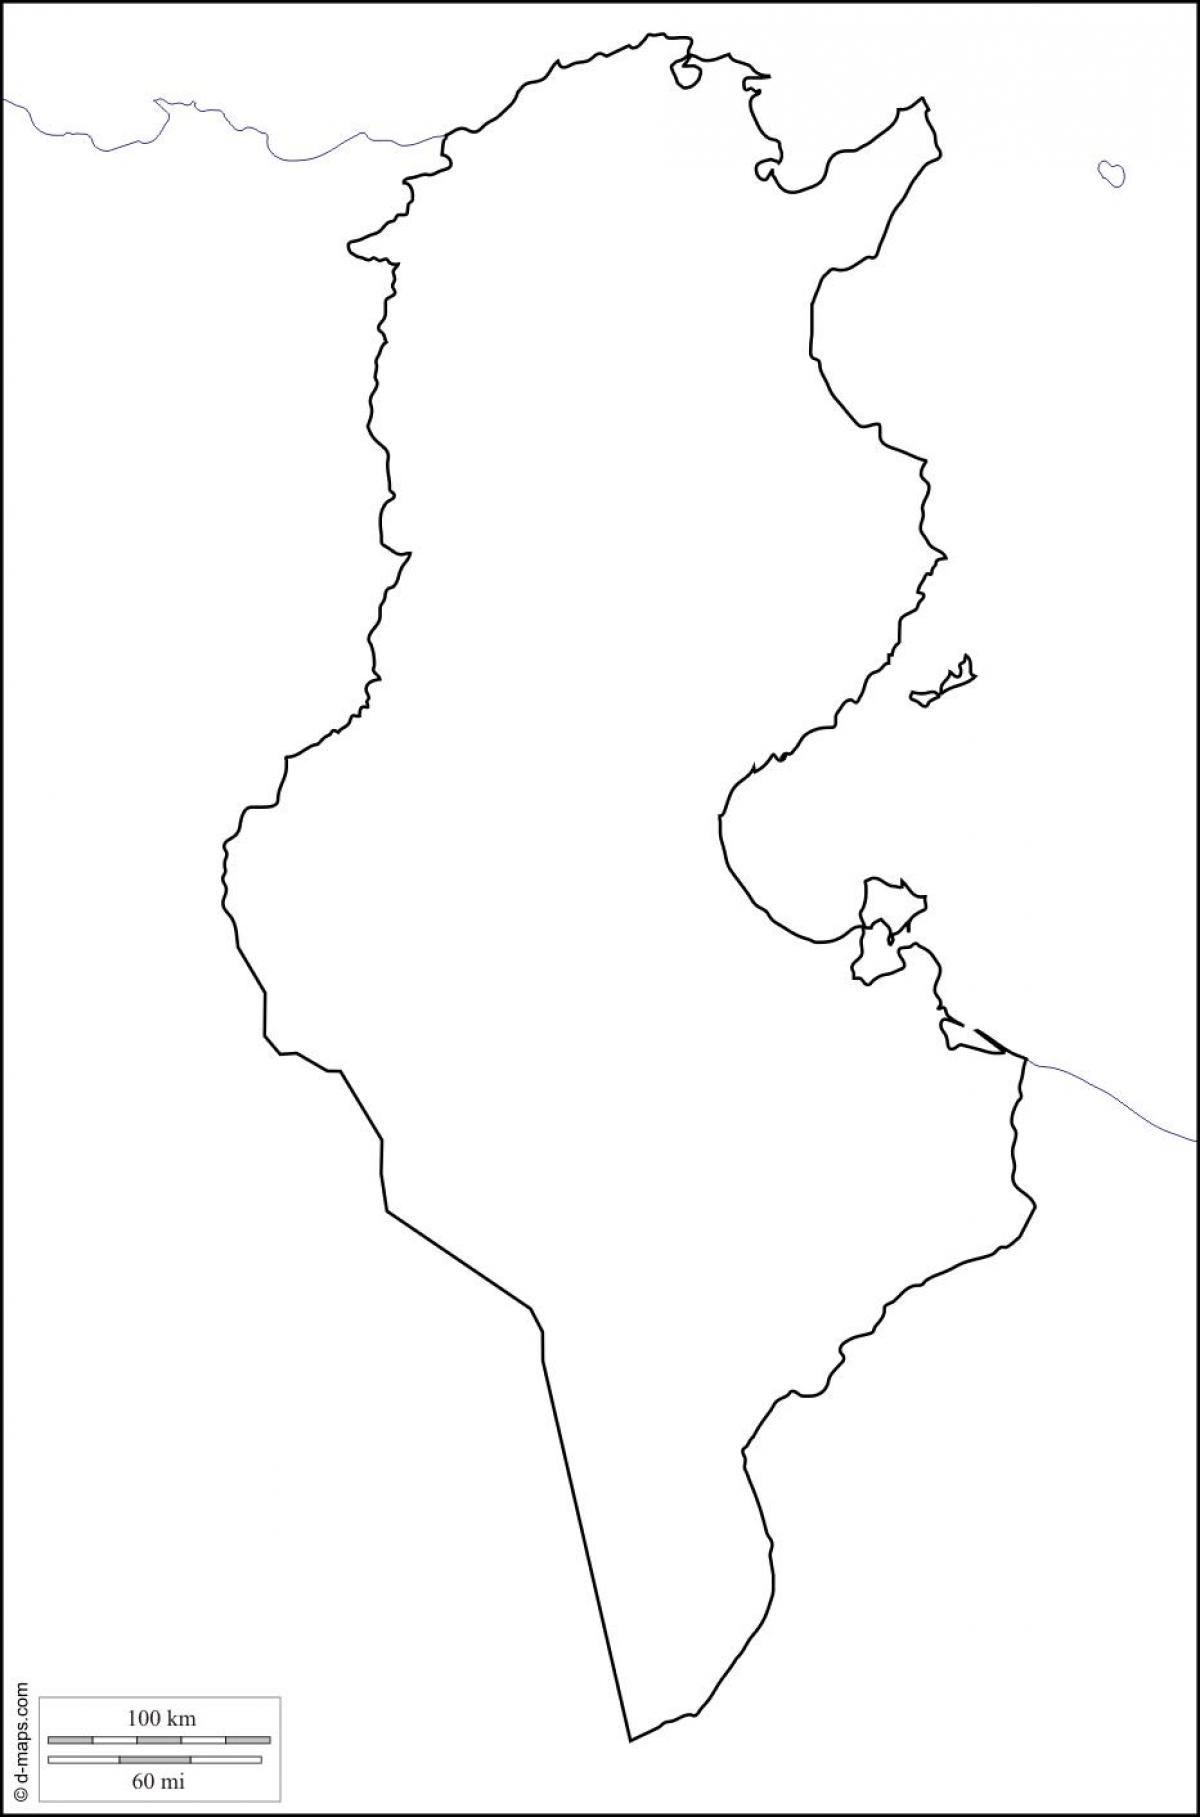 Tunisie Vide La Carte Carte De La Tunisie Vide Afrique Du